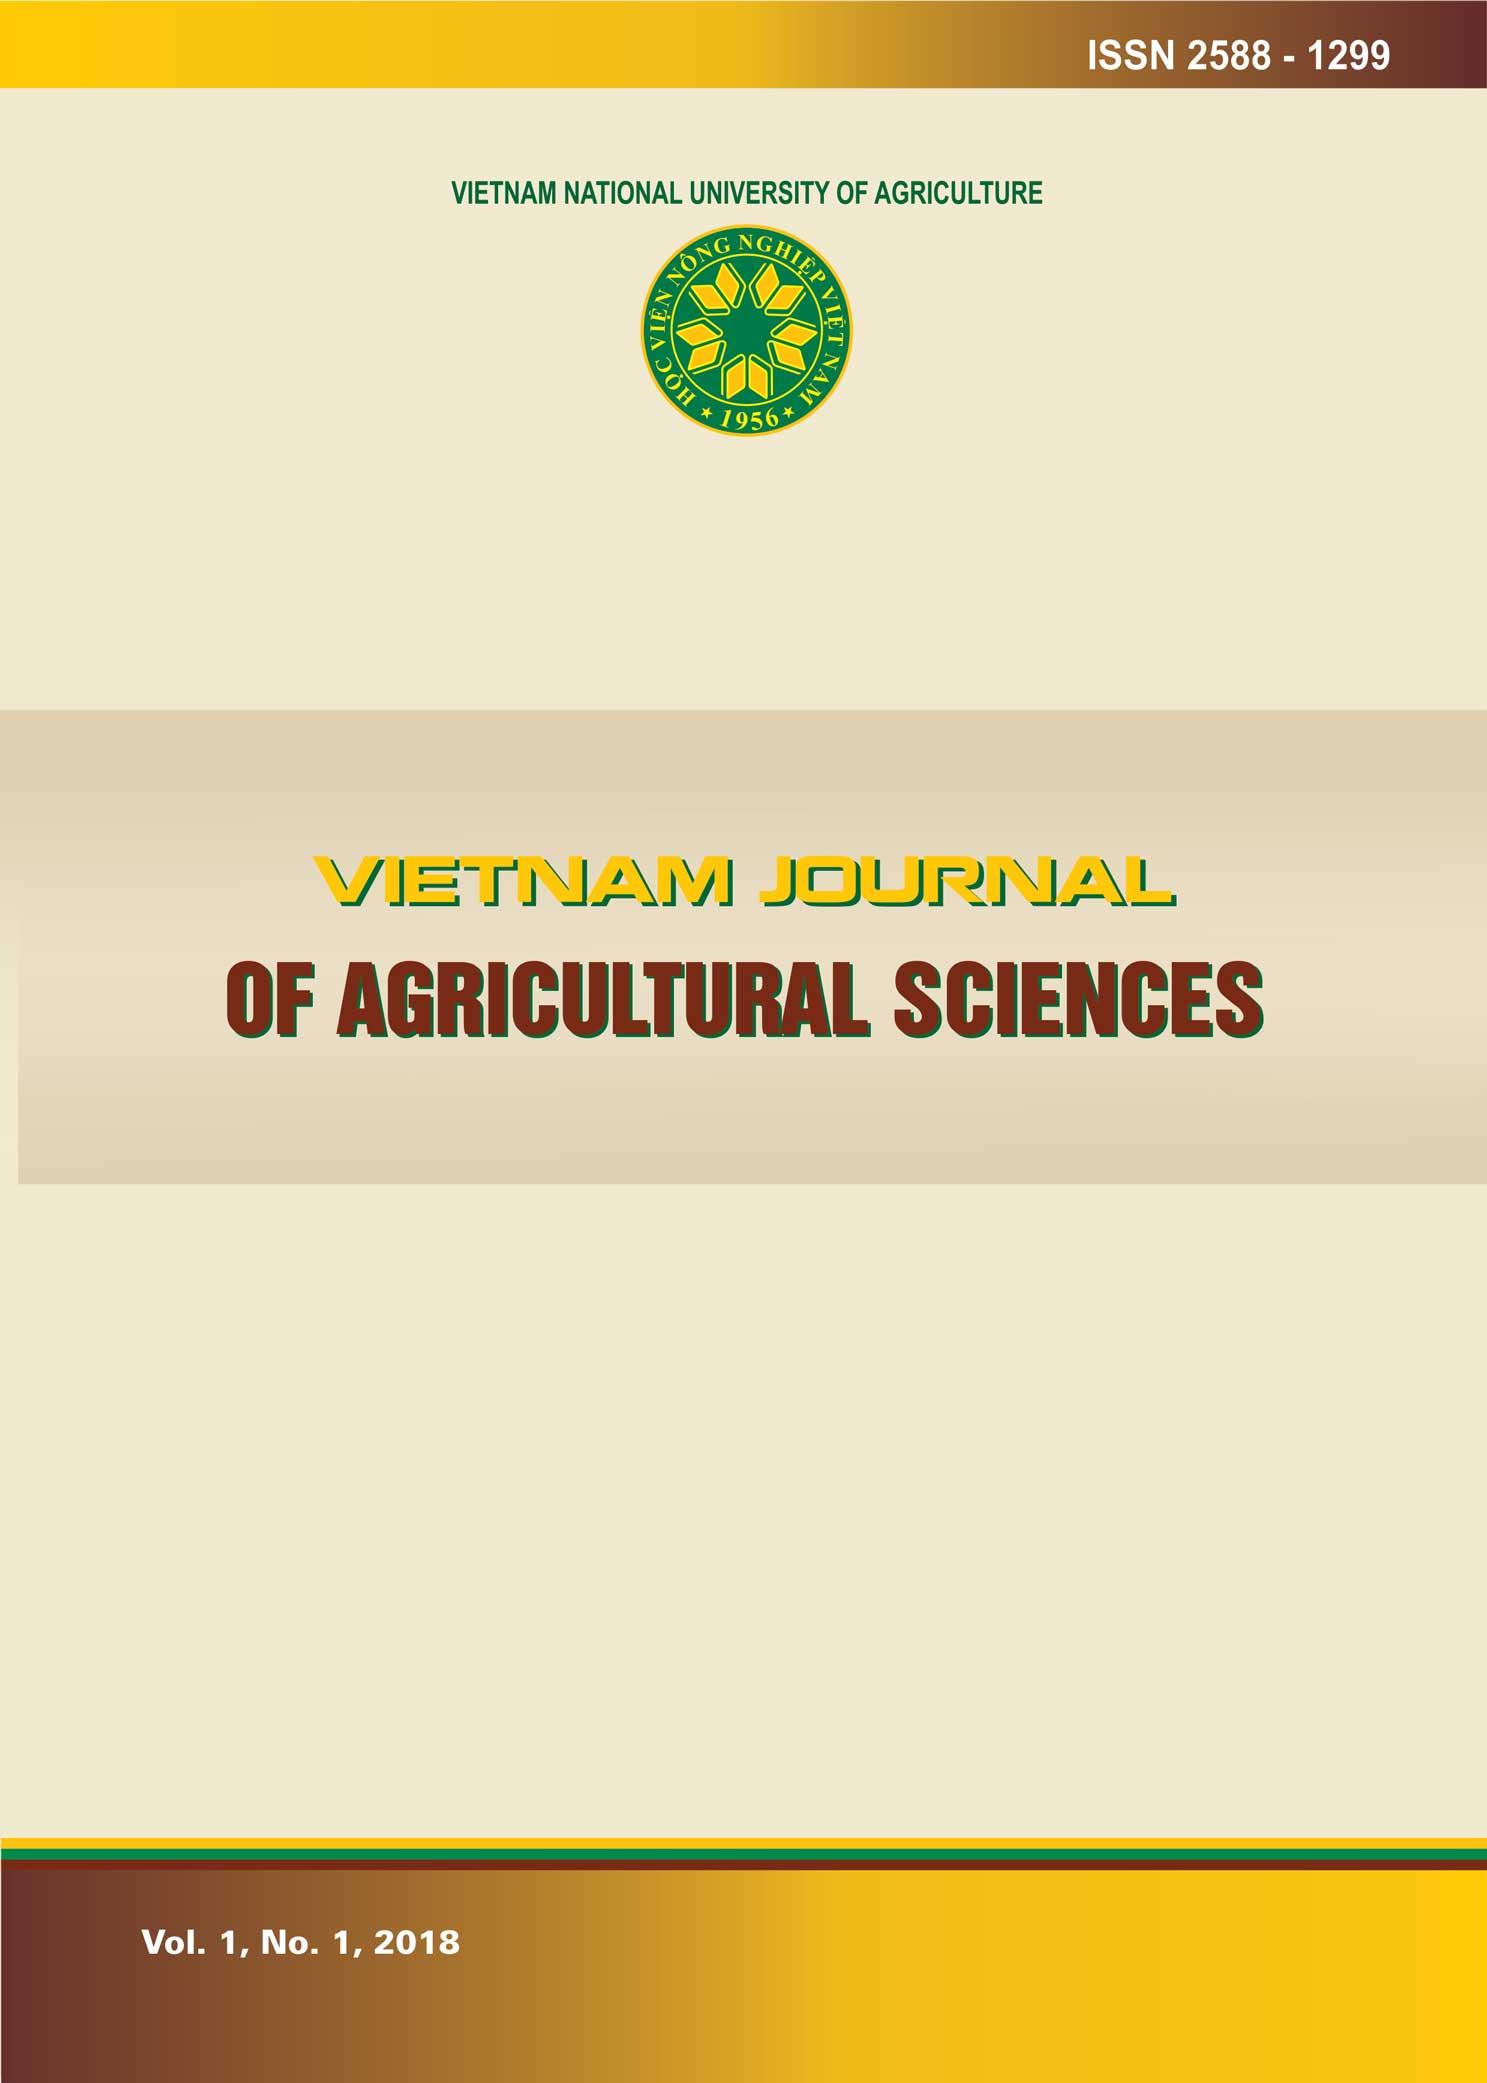 Vietnam Journal of Agricultural Sciences